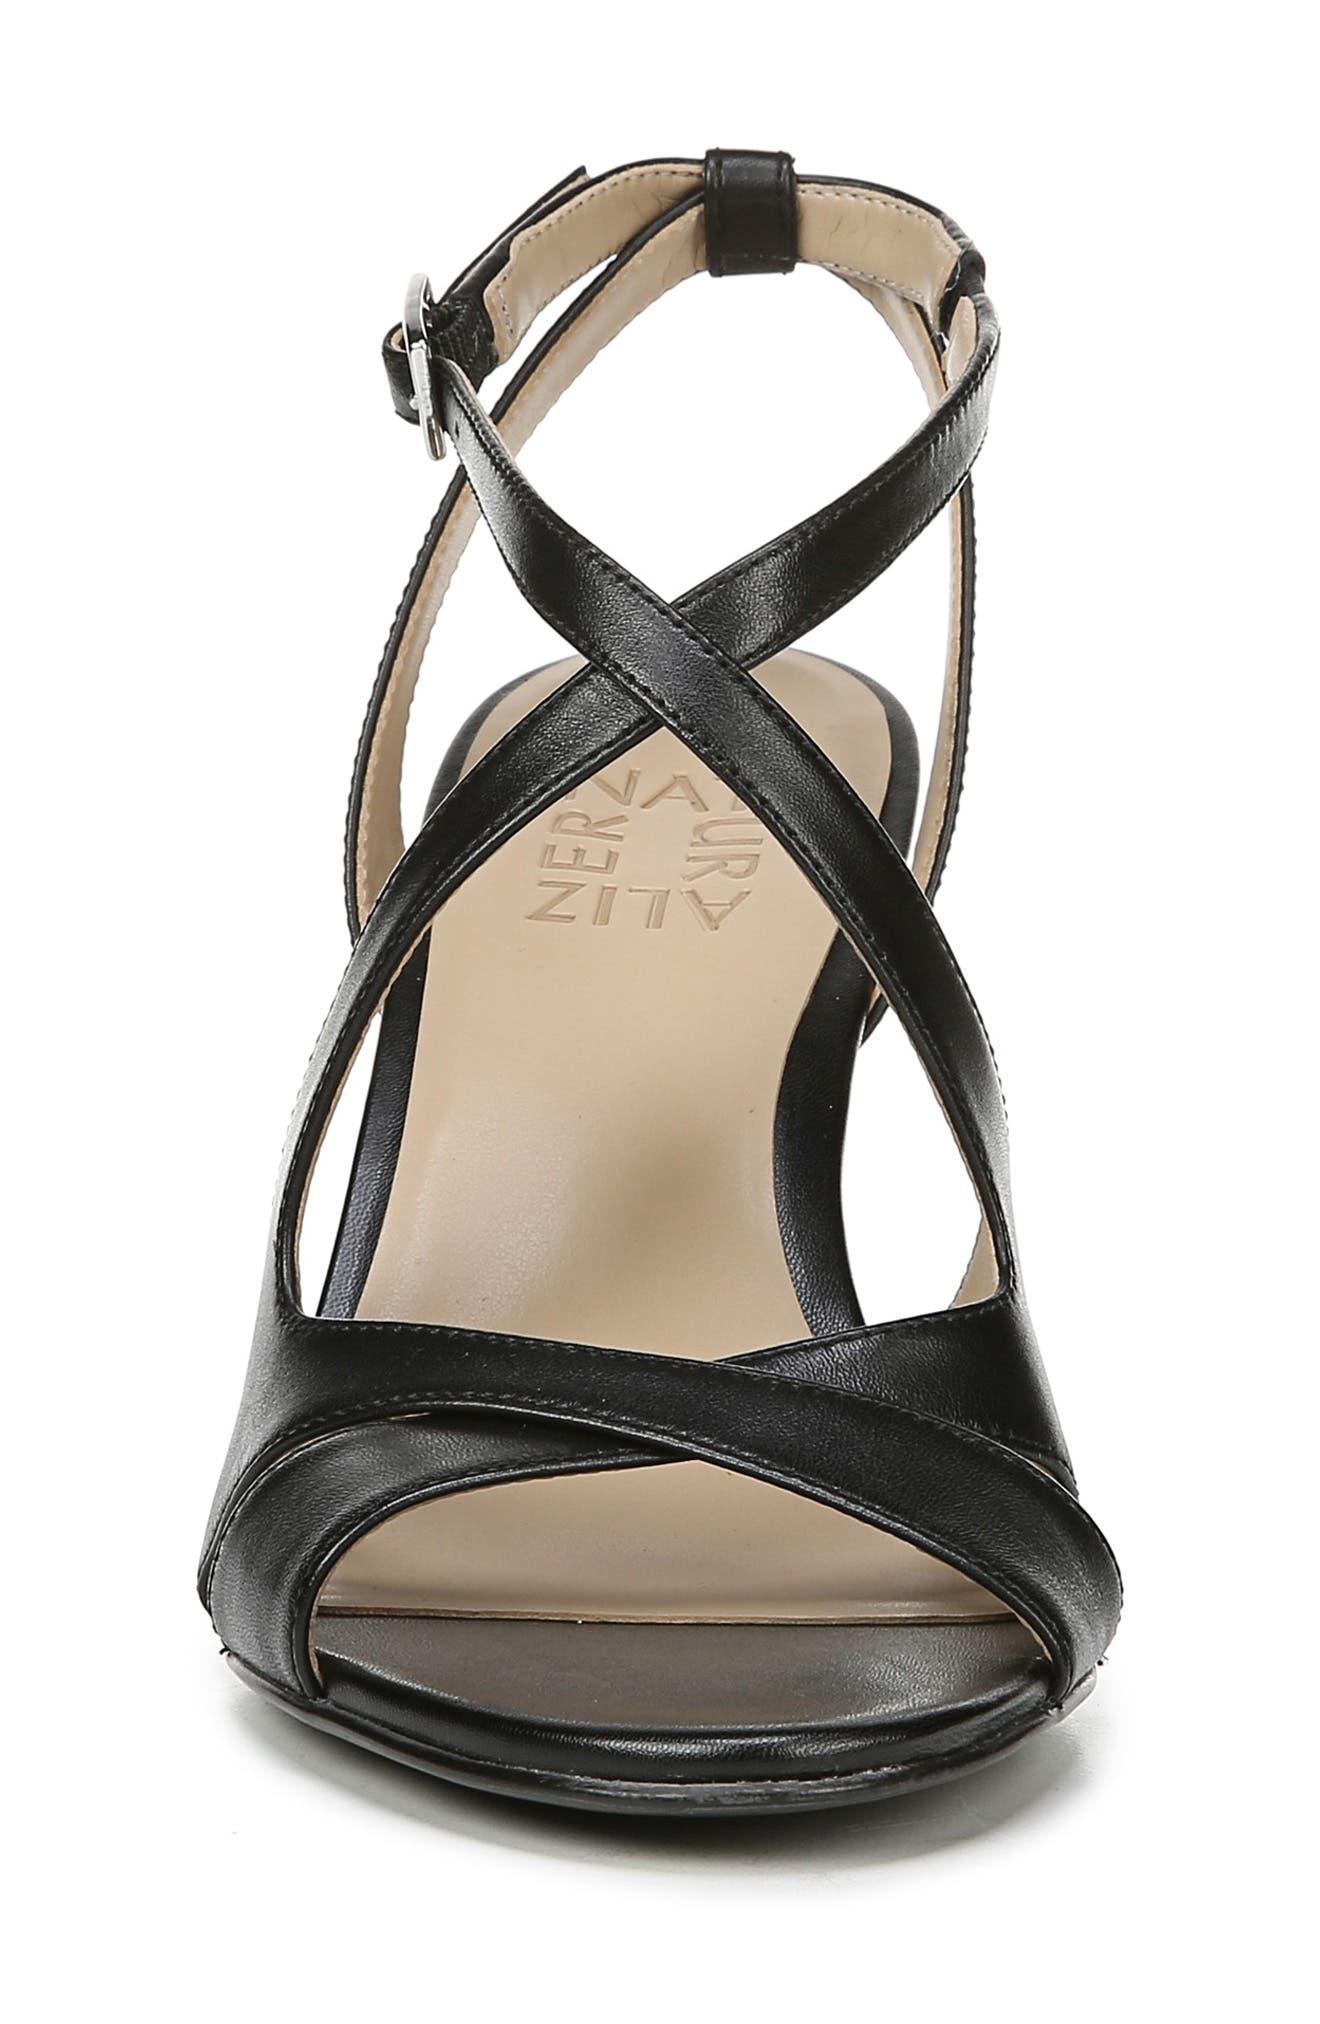 NATURALIZER, Klein Strappy Sandal, Alternate thumbnail 4, color, BLACK LEATHER